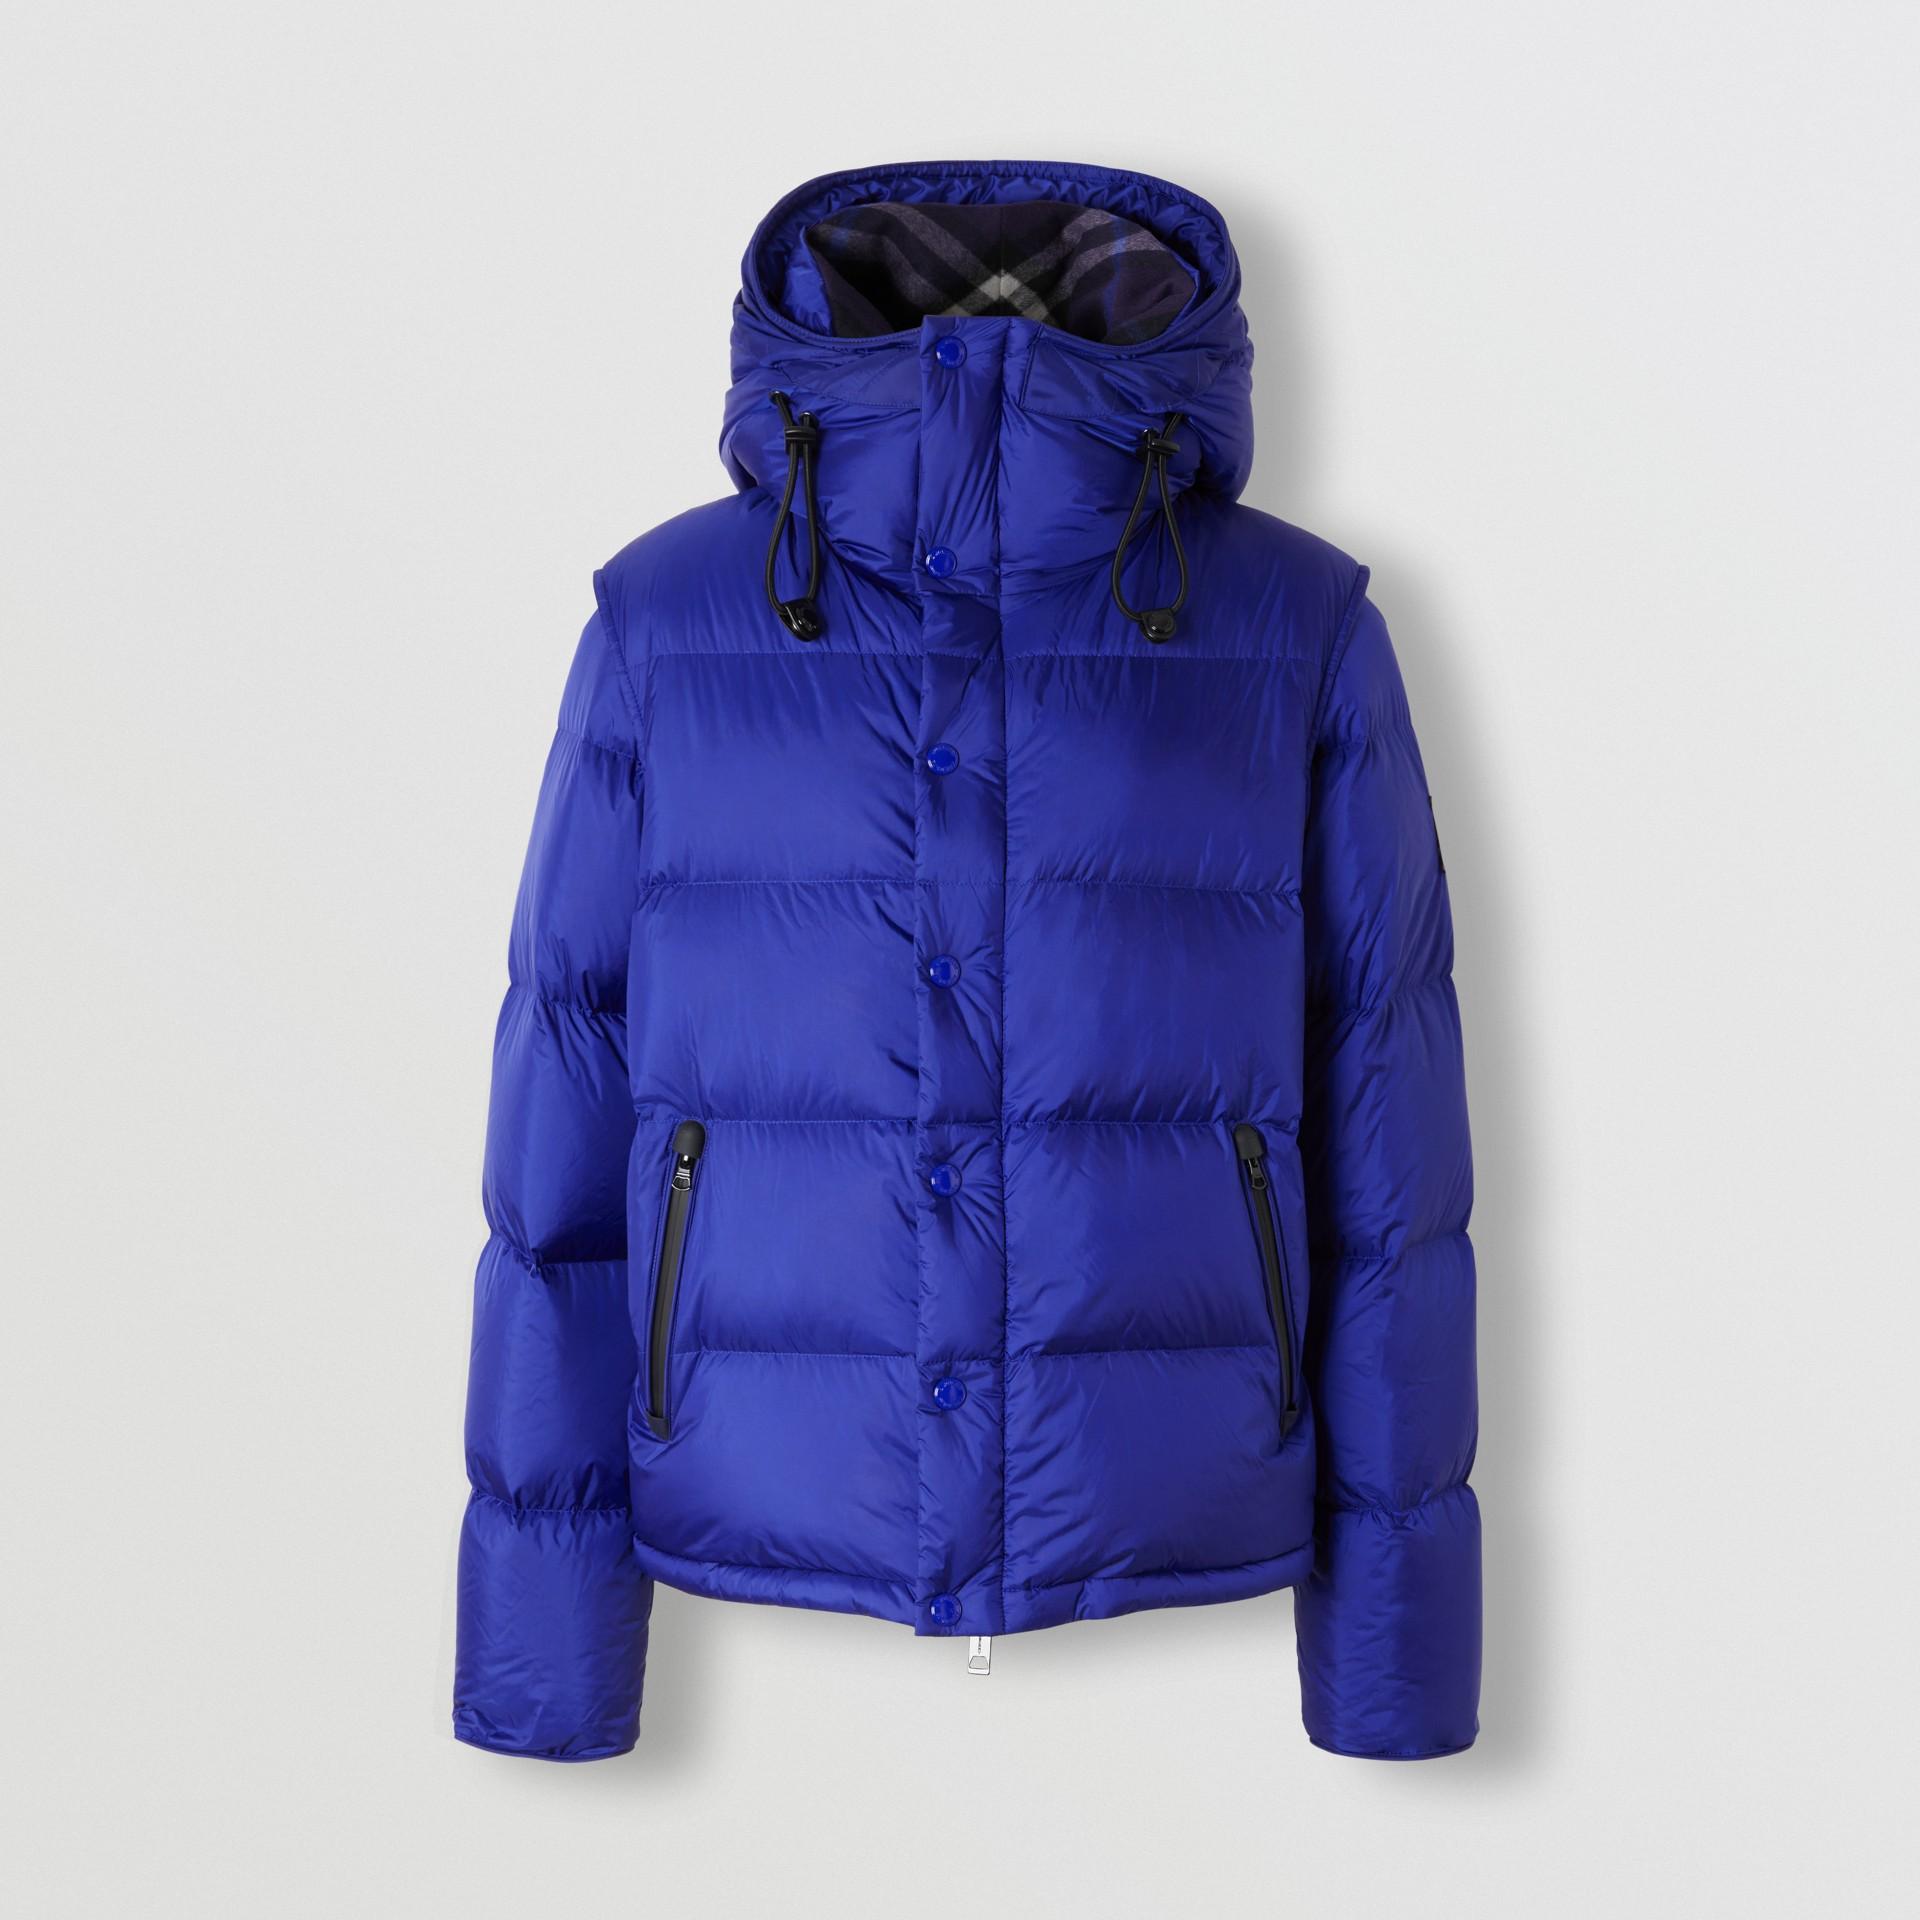 Detachable Sleeve Hooded Puffer Jacket in Dark Cobalt Blue - Men | Burberry - gallery image 3